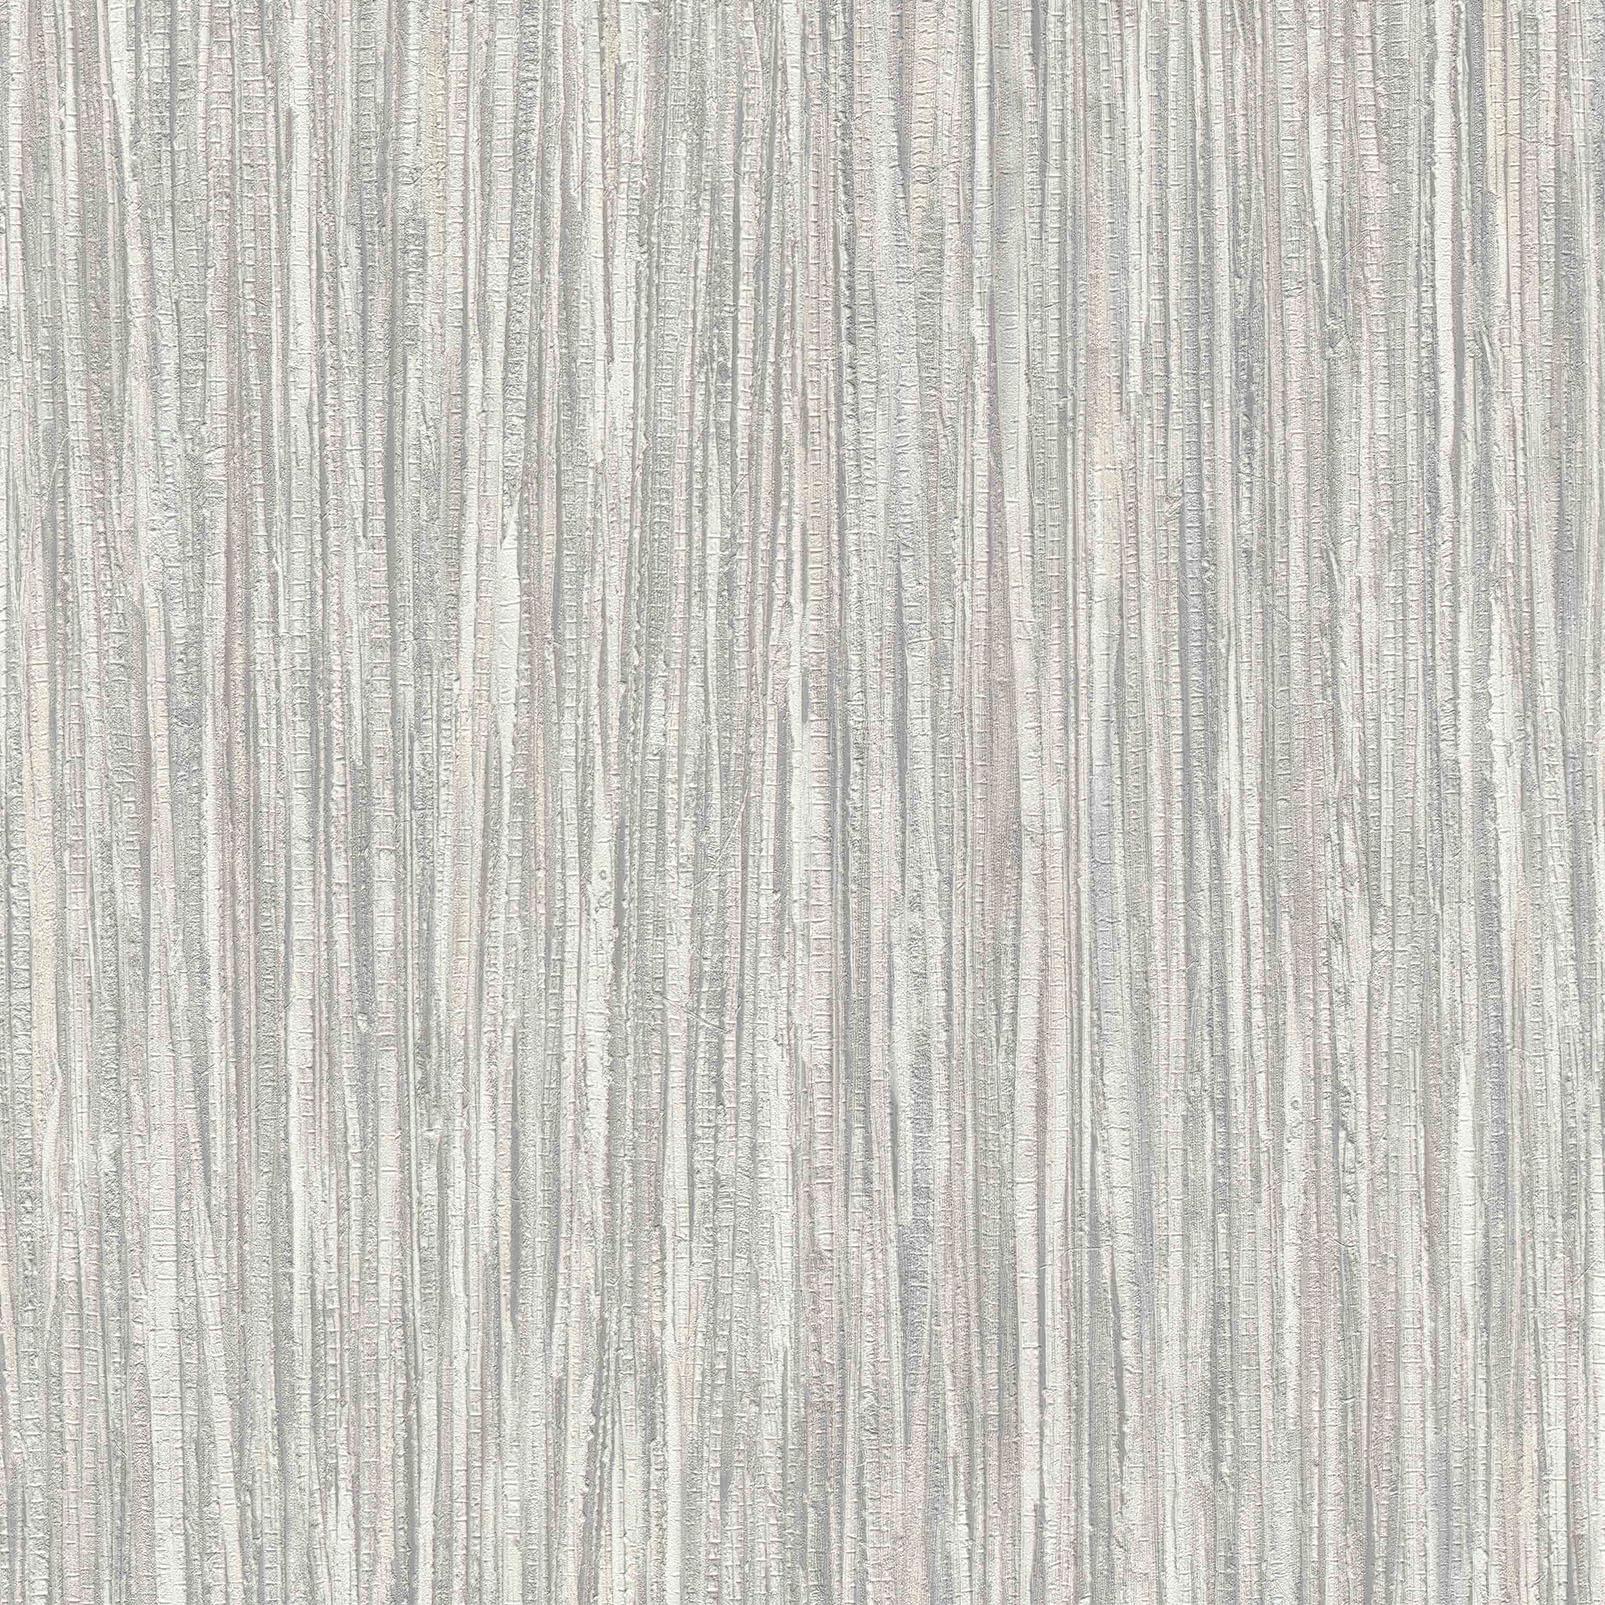 RM2 SAVANA RM2 219870 WHITE